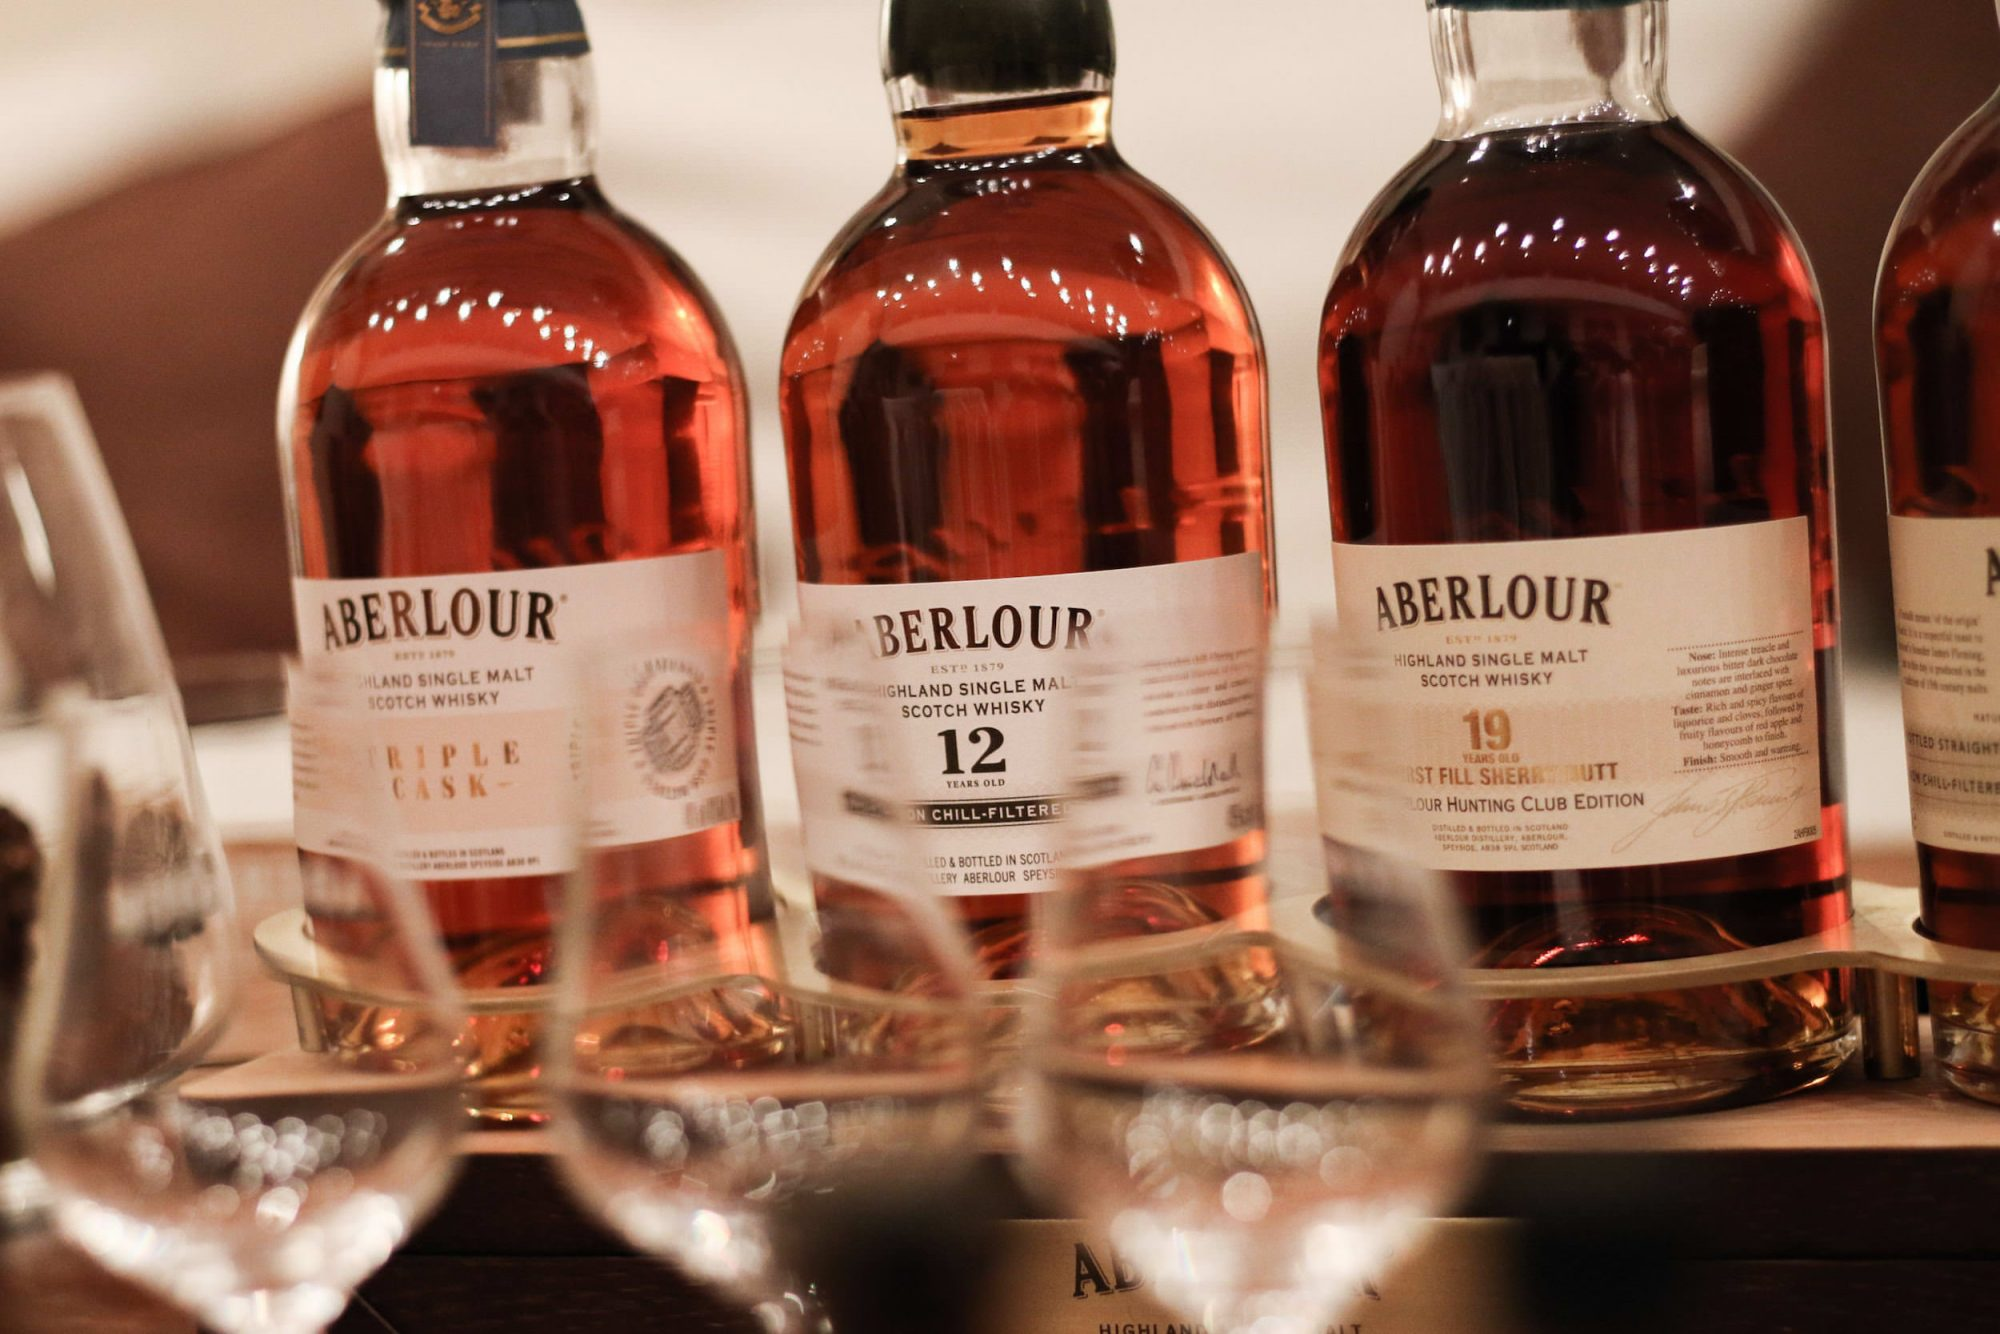 choisir un whisky